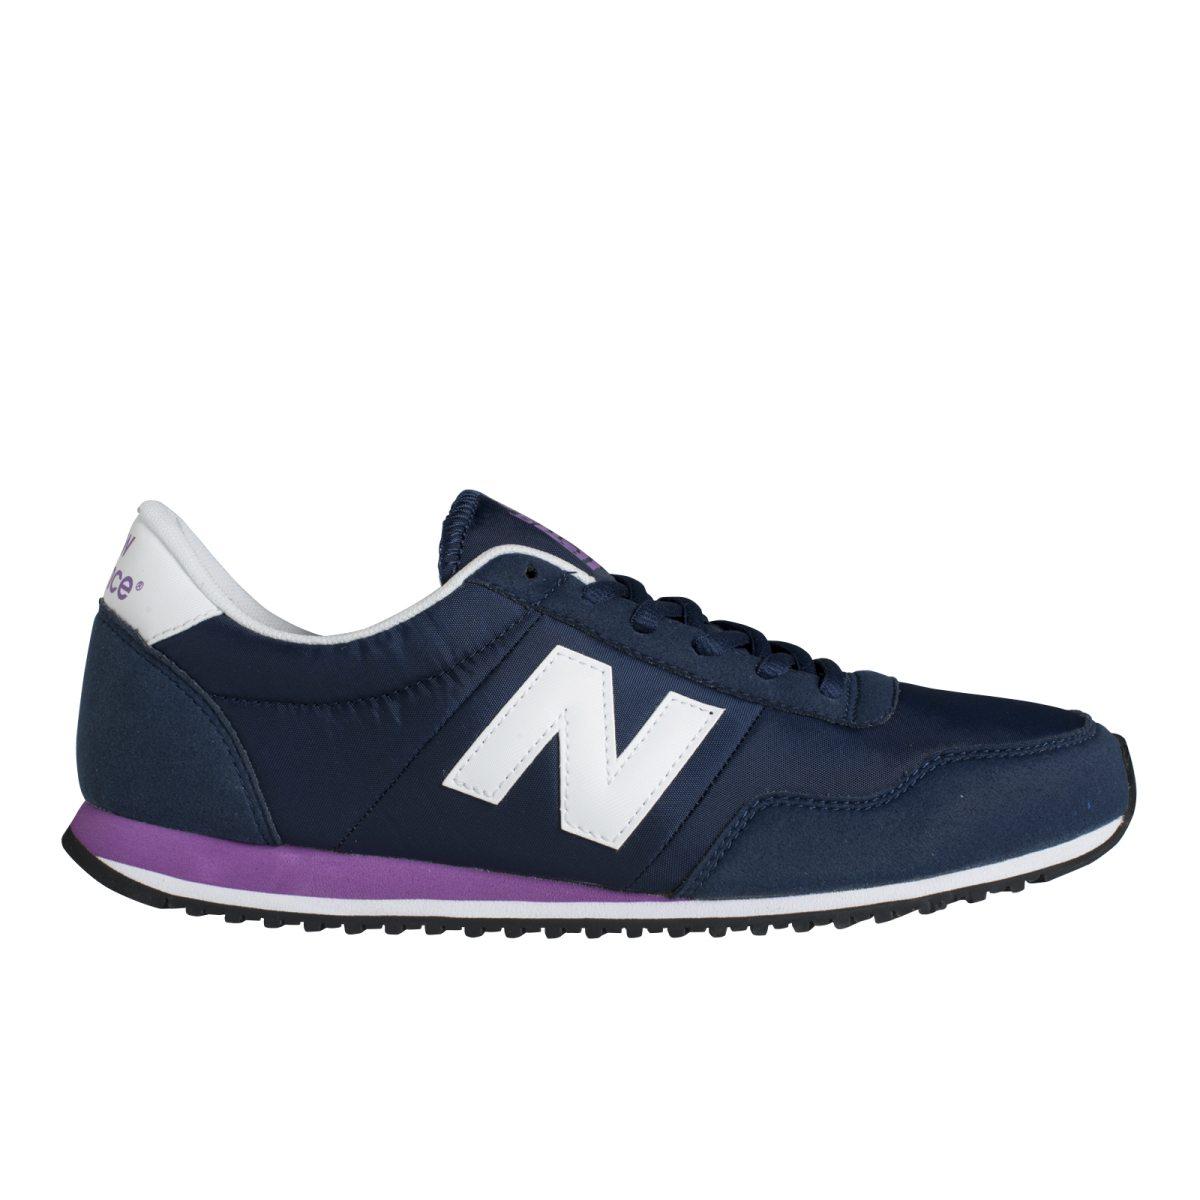 huge selection of ec6b5 e8ba1 new balance 395 fritidssko dam fritidsskor   sneakers